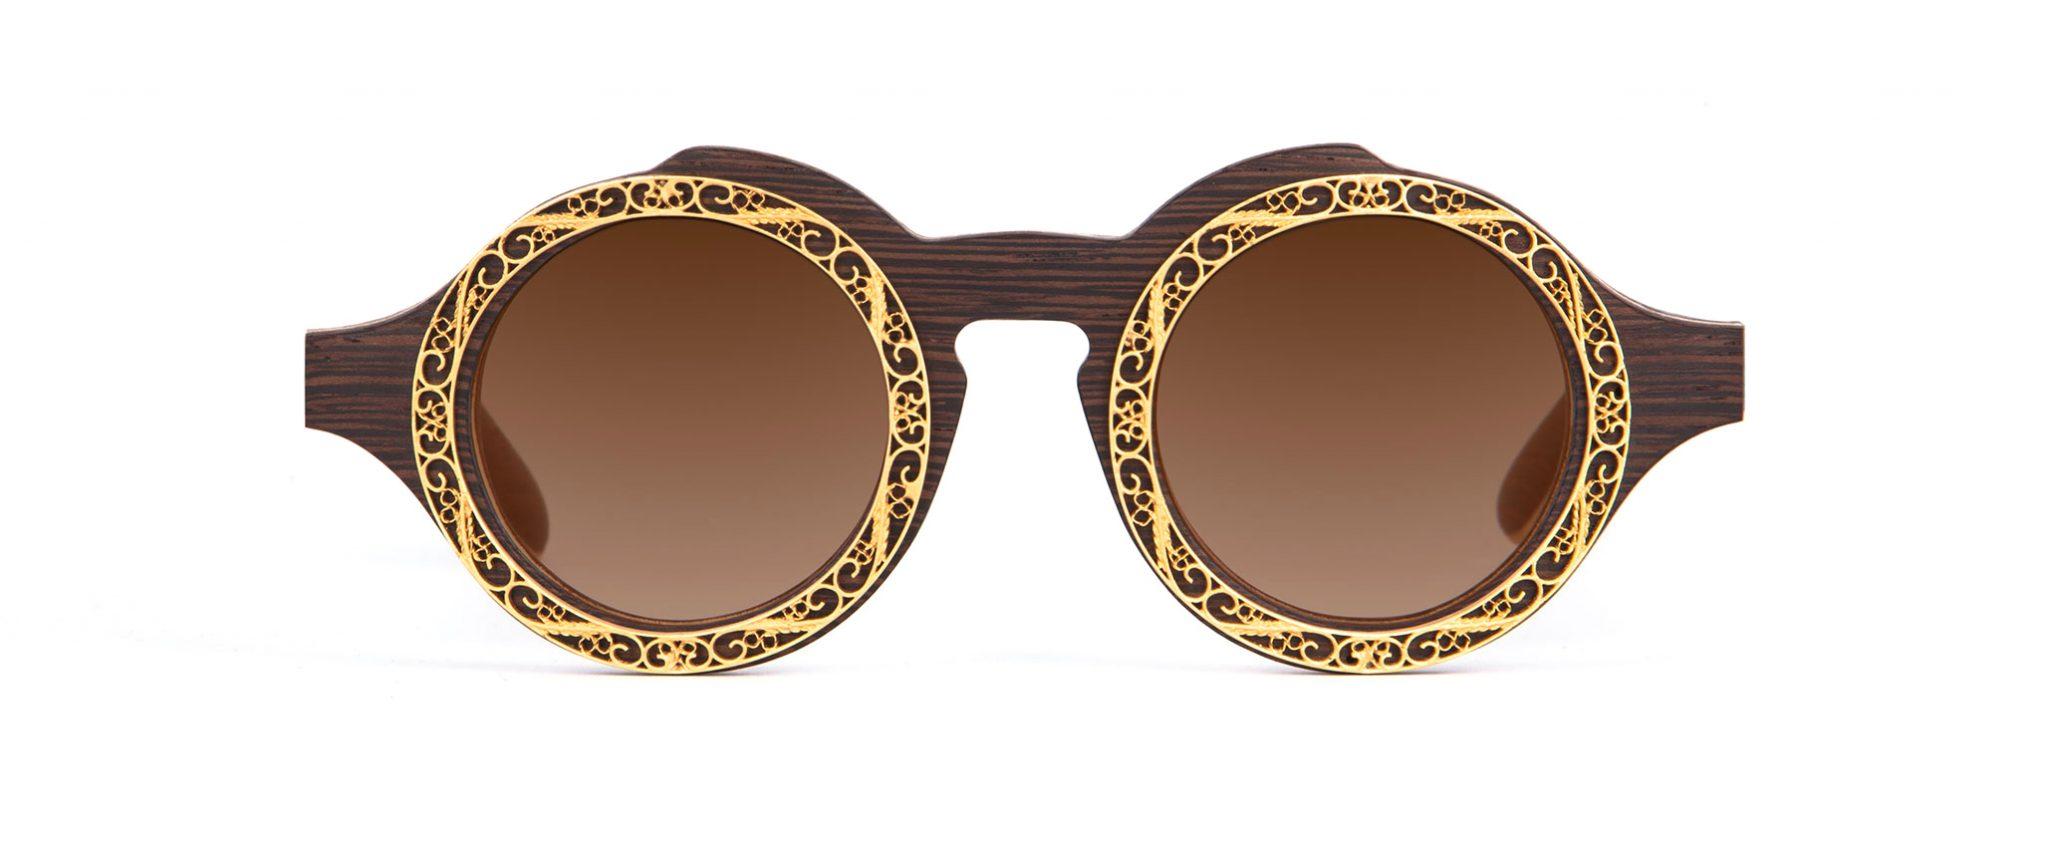 Color Of Spring 2017 Lella Wood Sunglasses Vakay Eyewear Designer Sunglasses